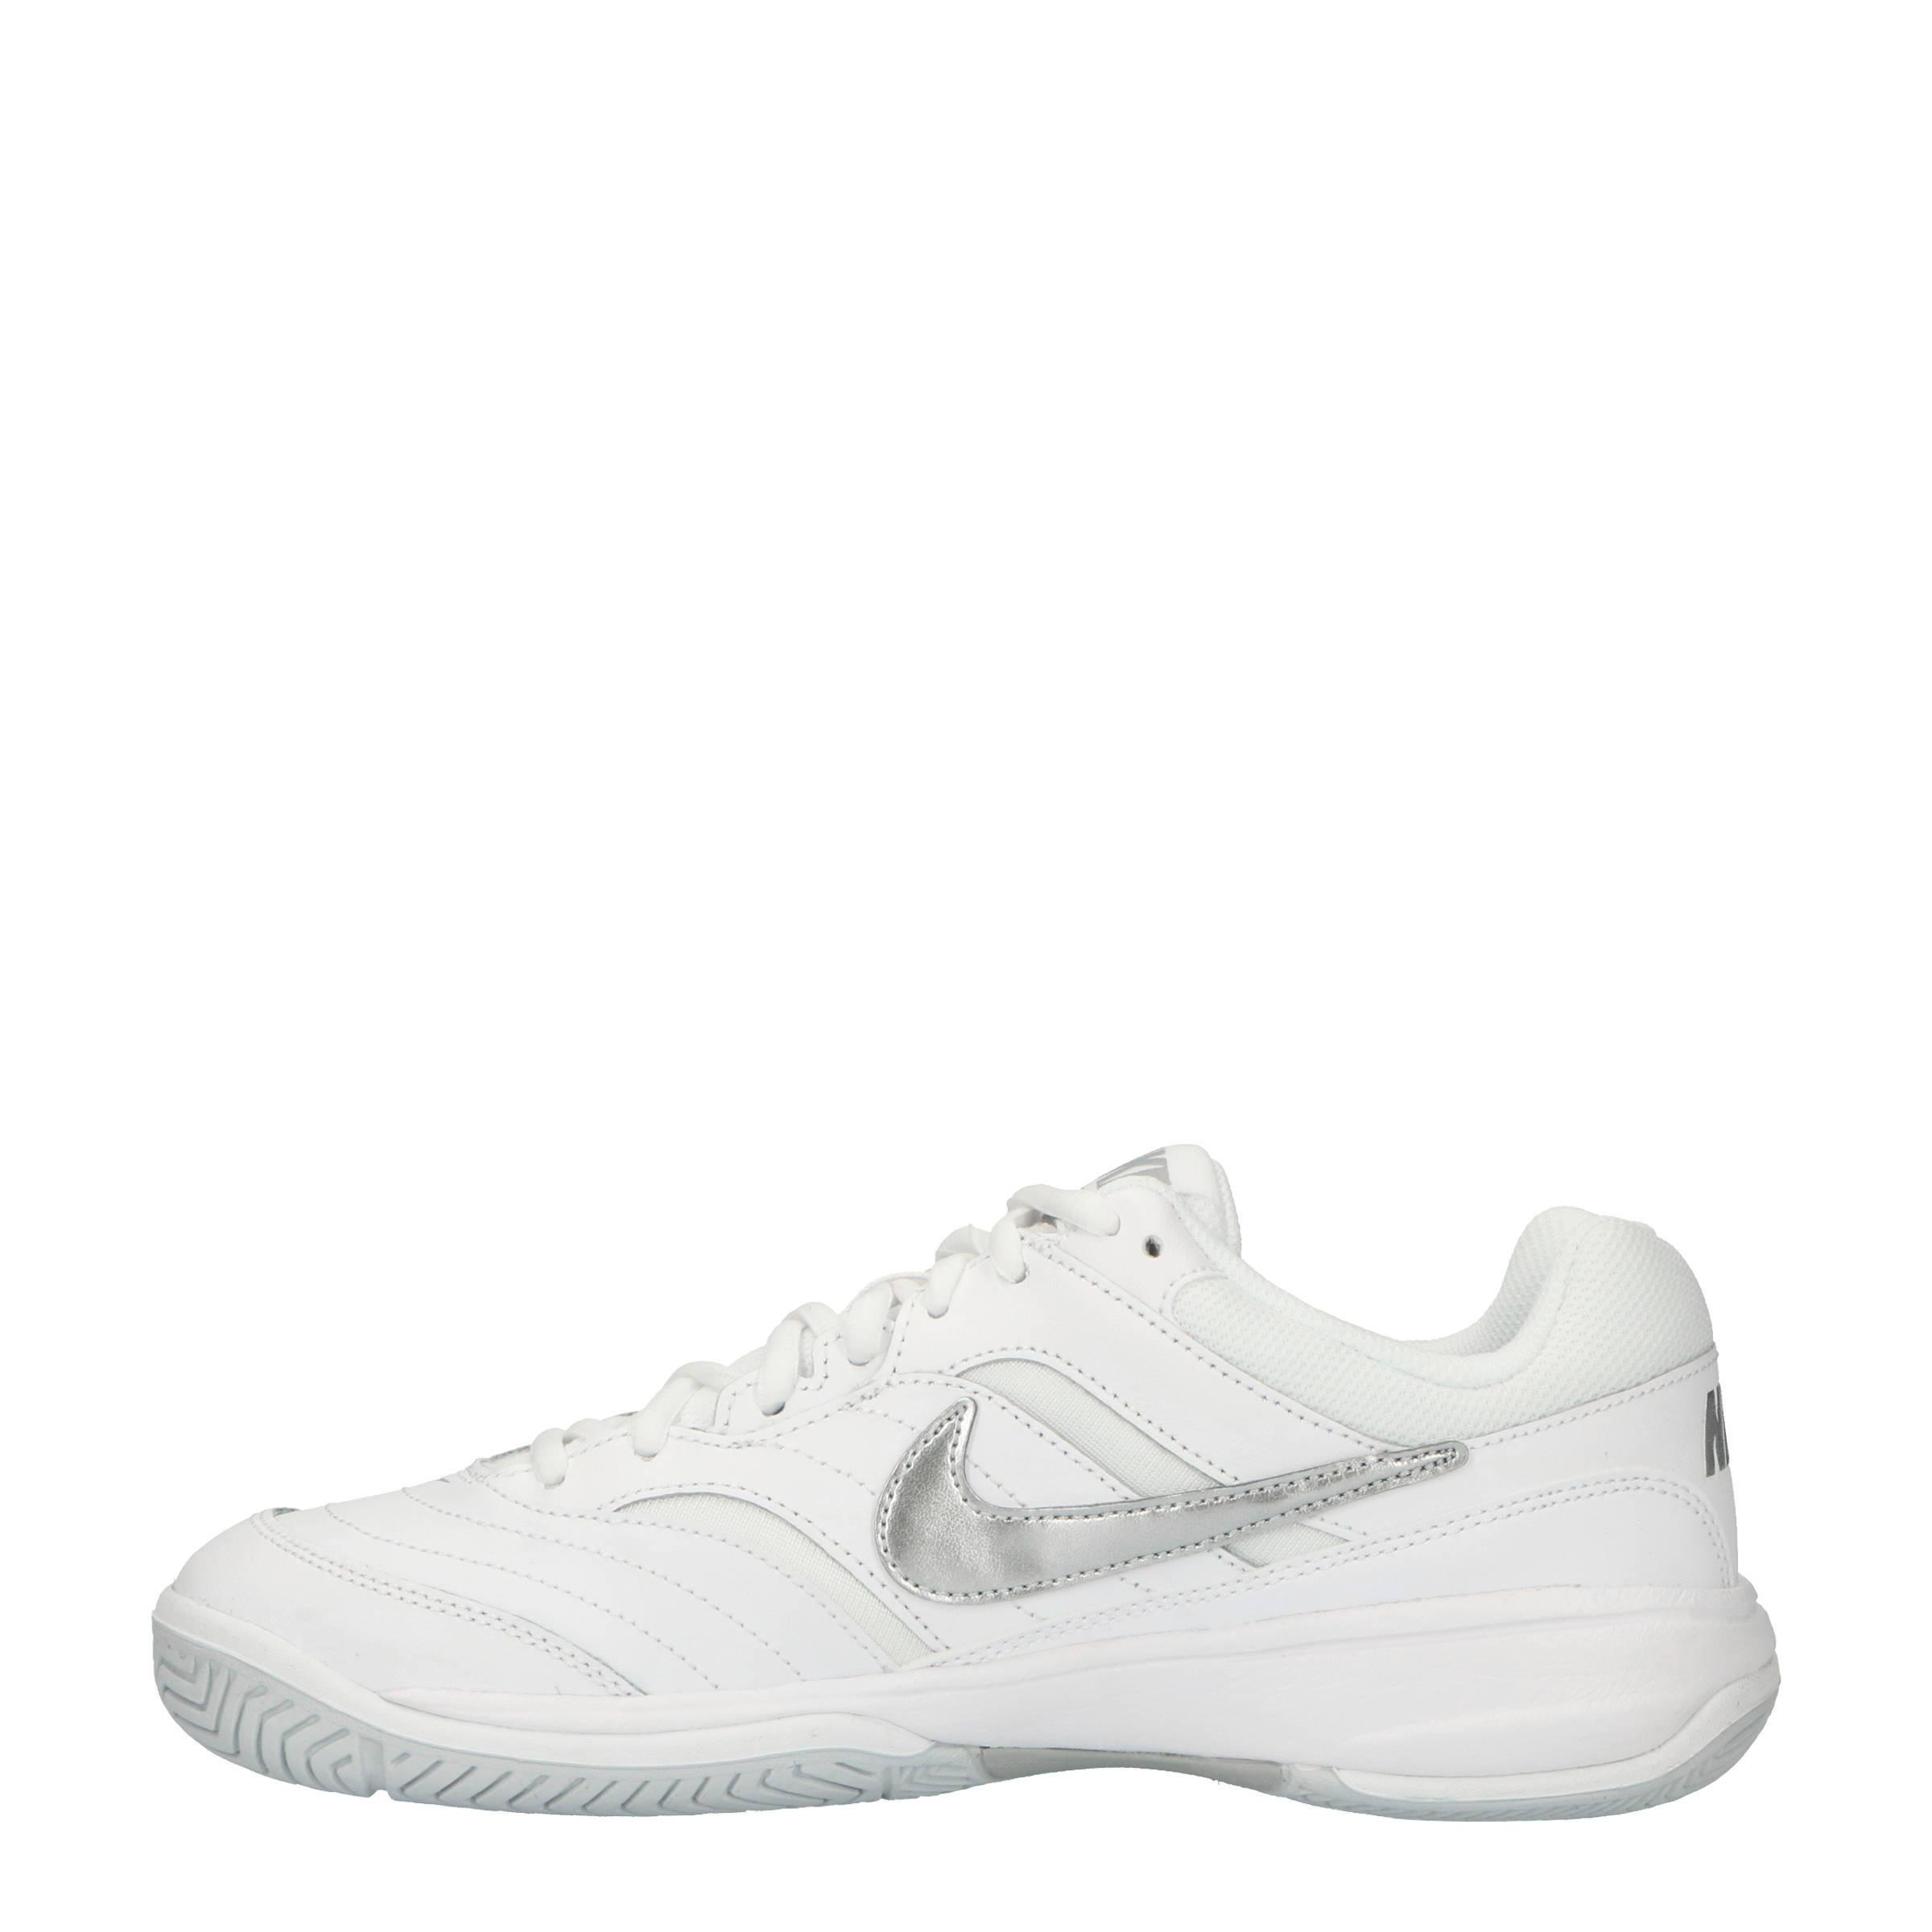 brand new c6452 2abd0 Nike Court Lite tennisschoenen witzilver  wehkamp